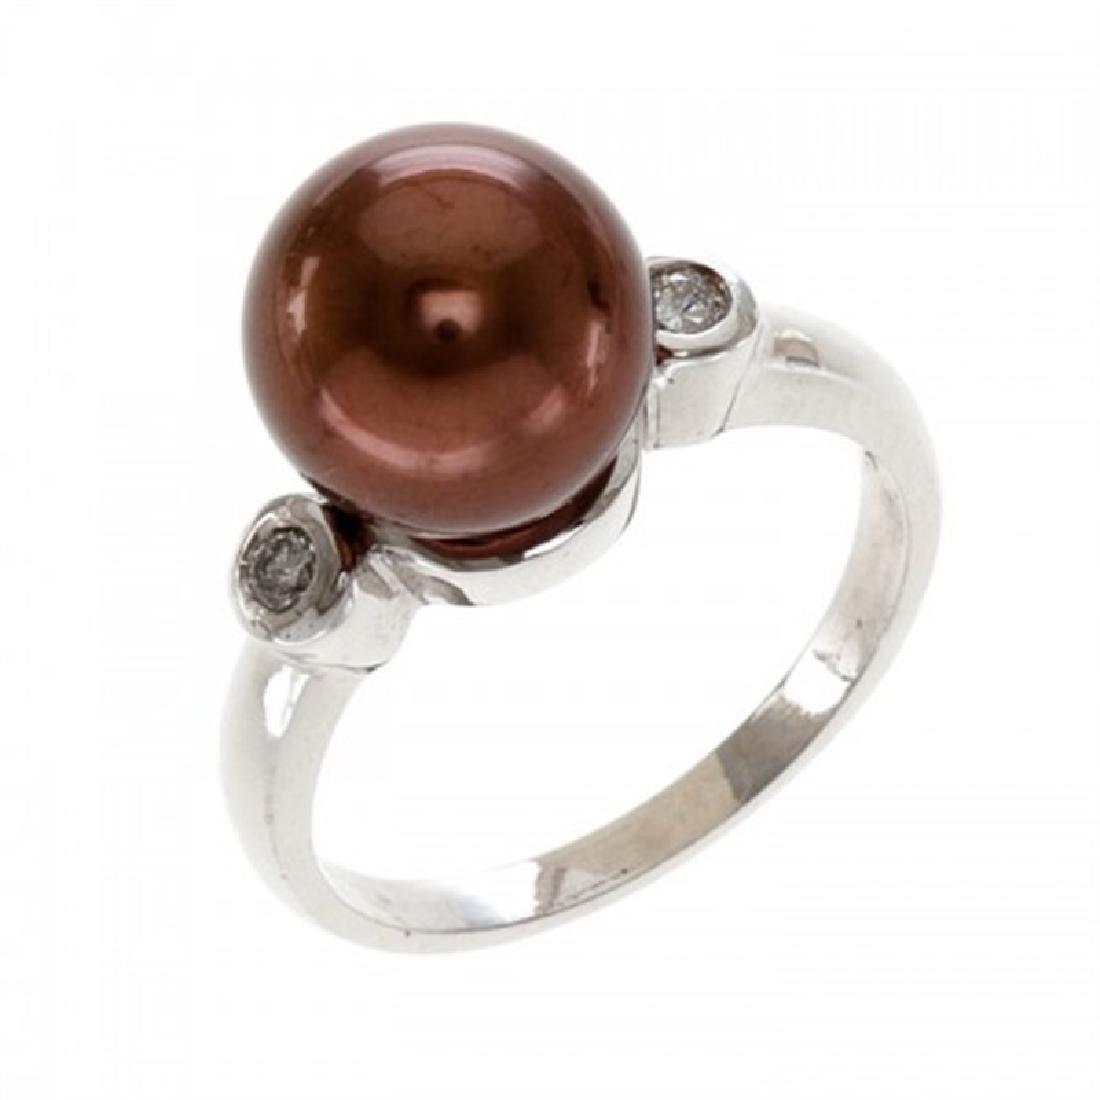 10.0-10.5mm Chocolate Tahitian Ring with Diamonds